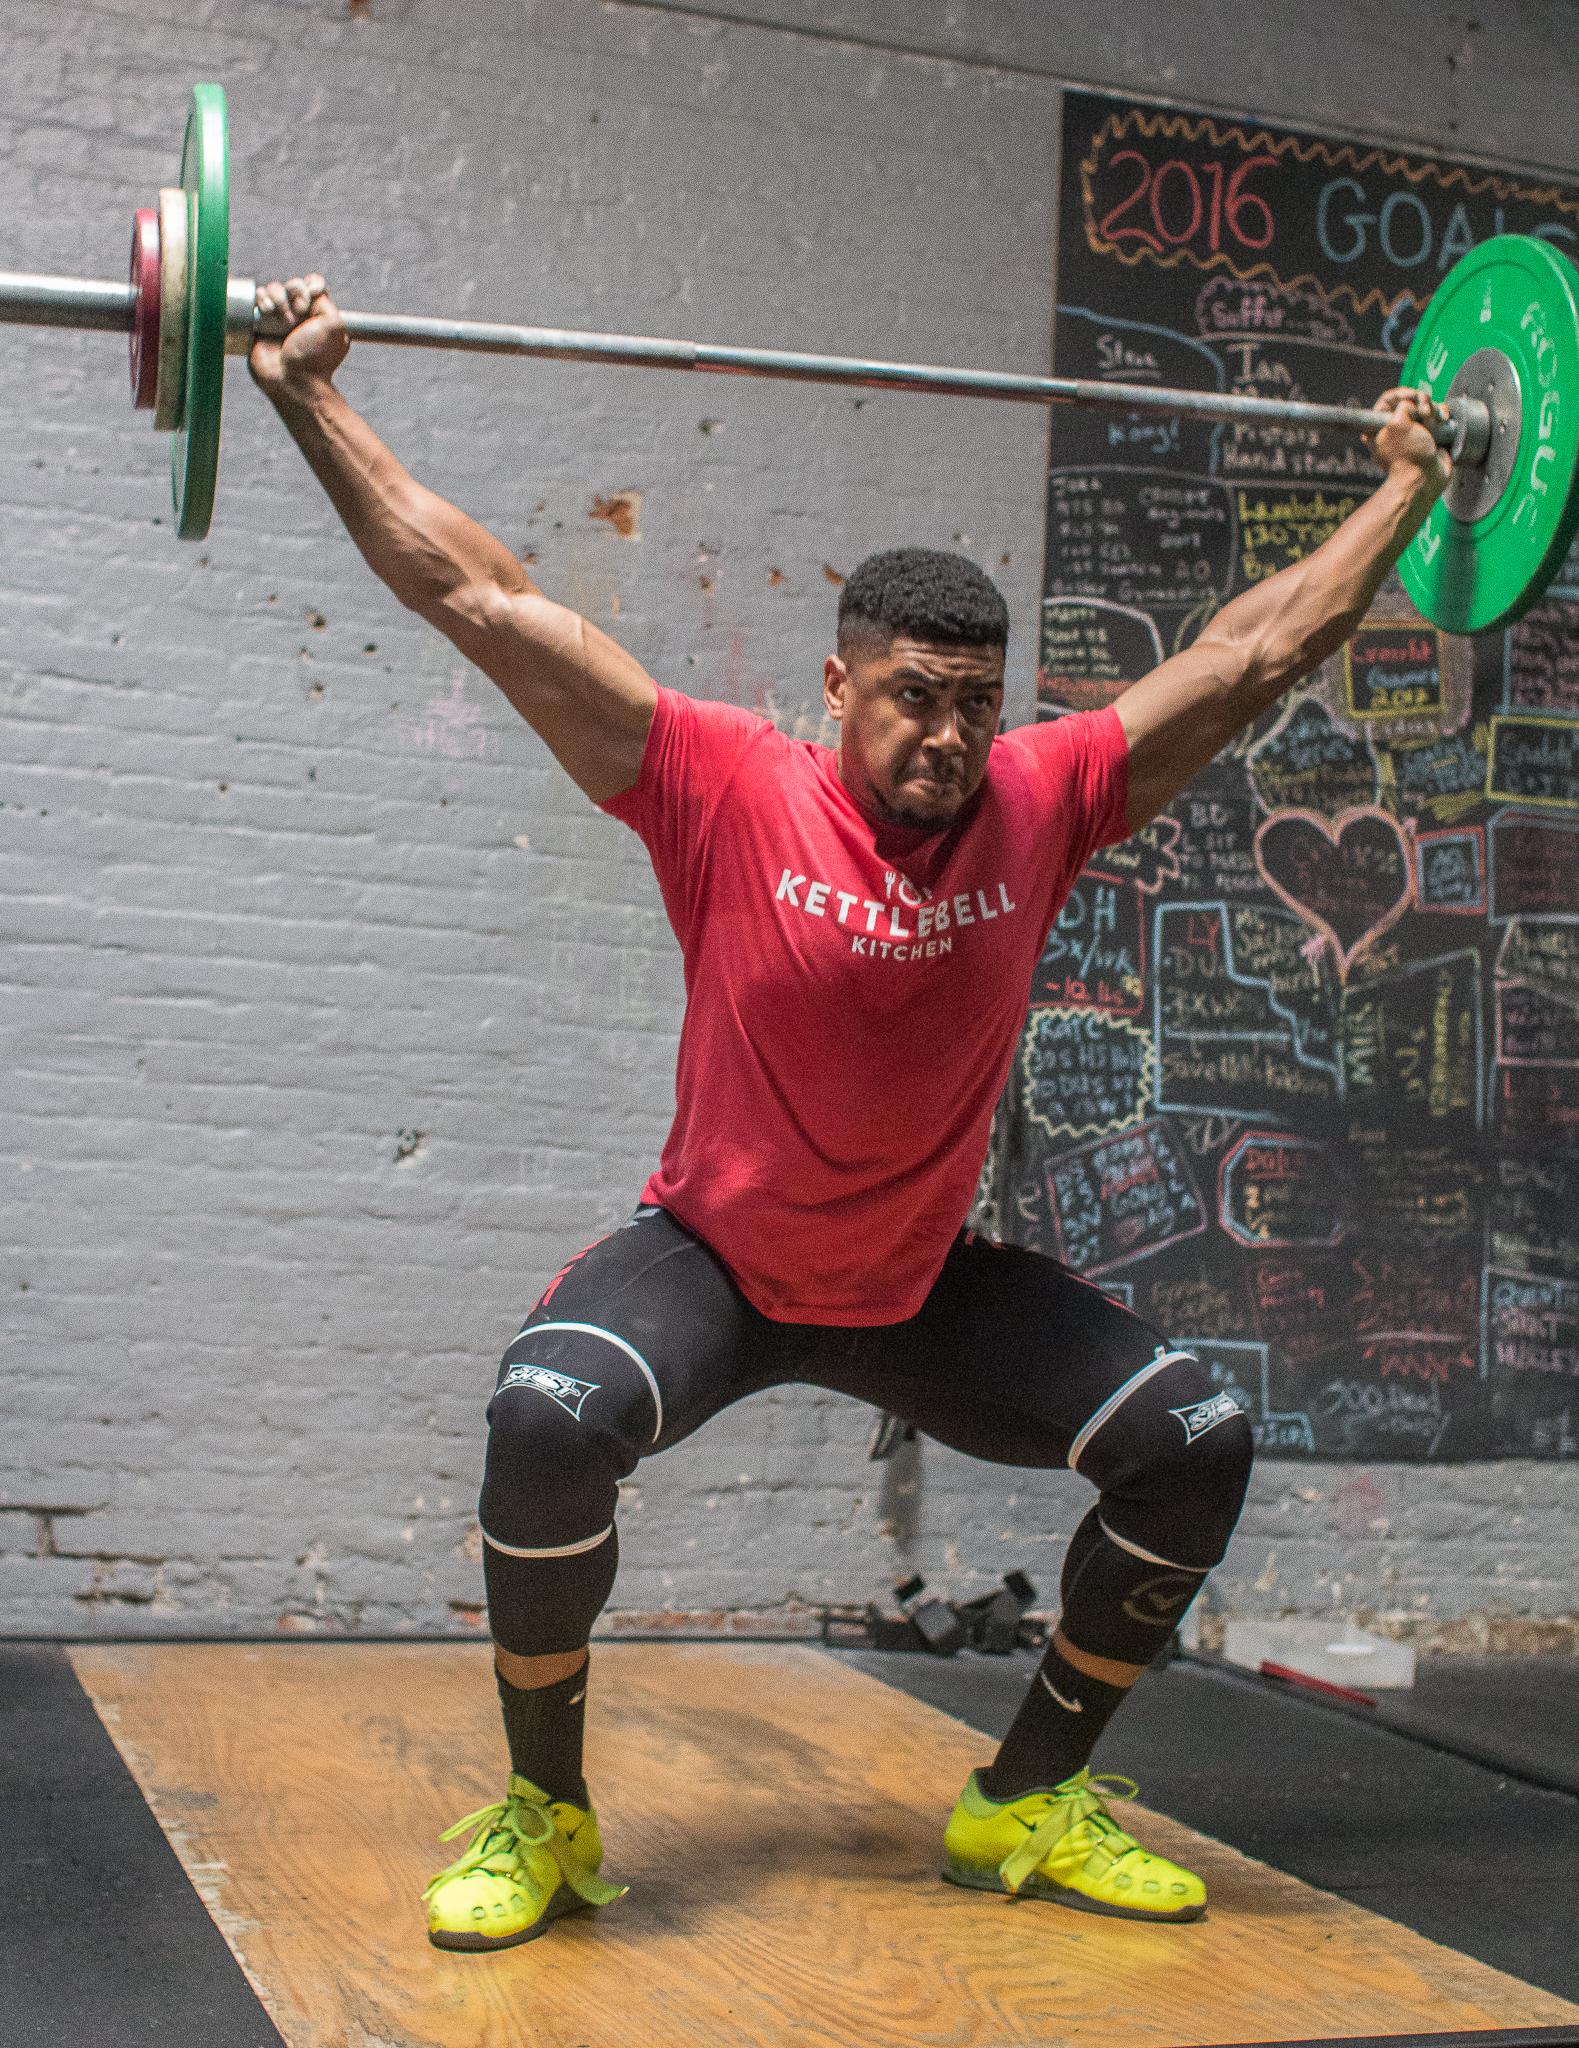 james-wright-visit-brooklyn-new-york-weightlifting-coach-teammates-october-2016 (32 of 92).jpg